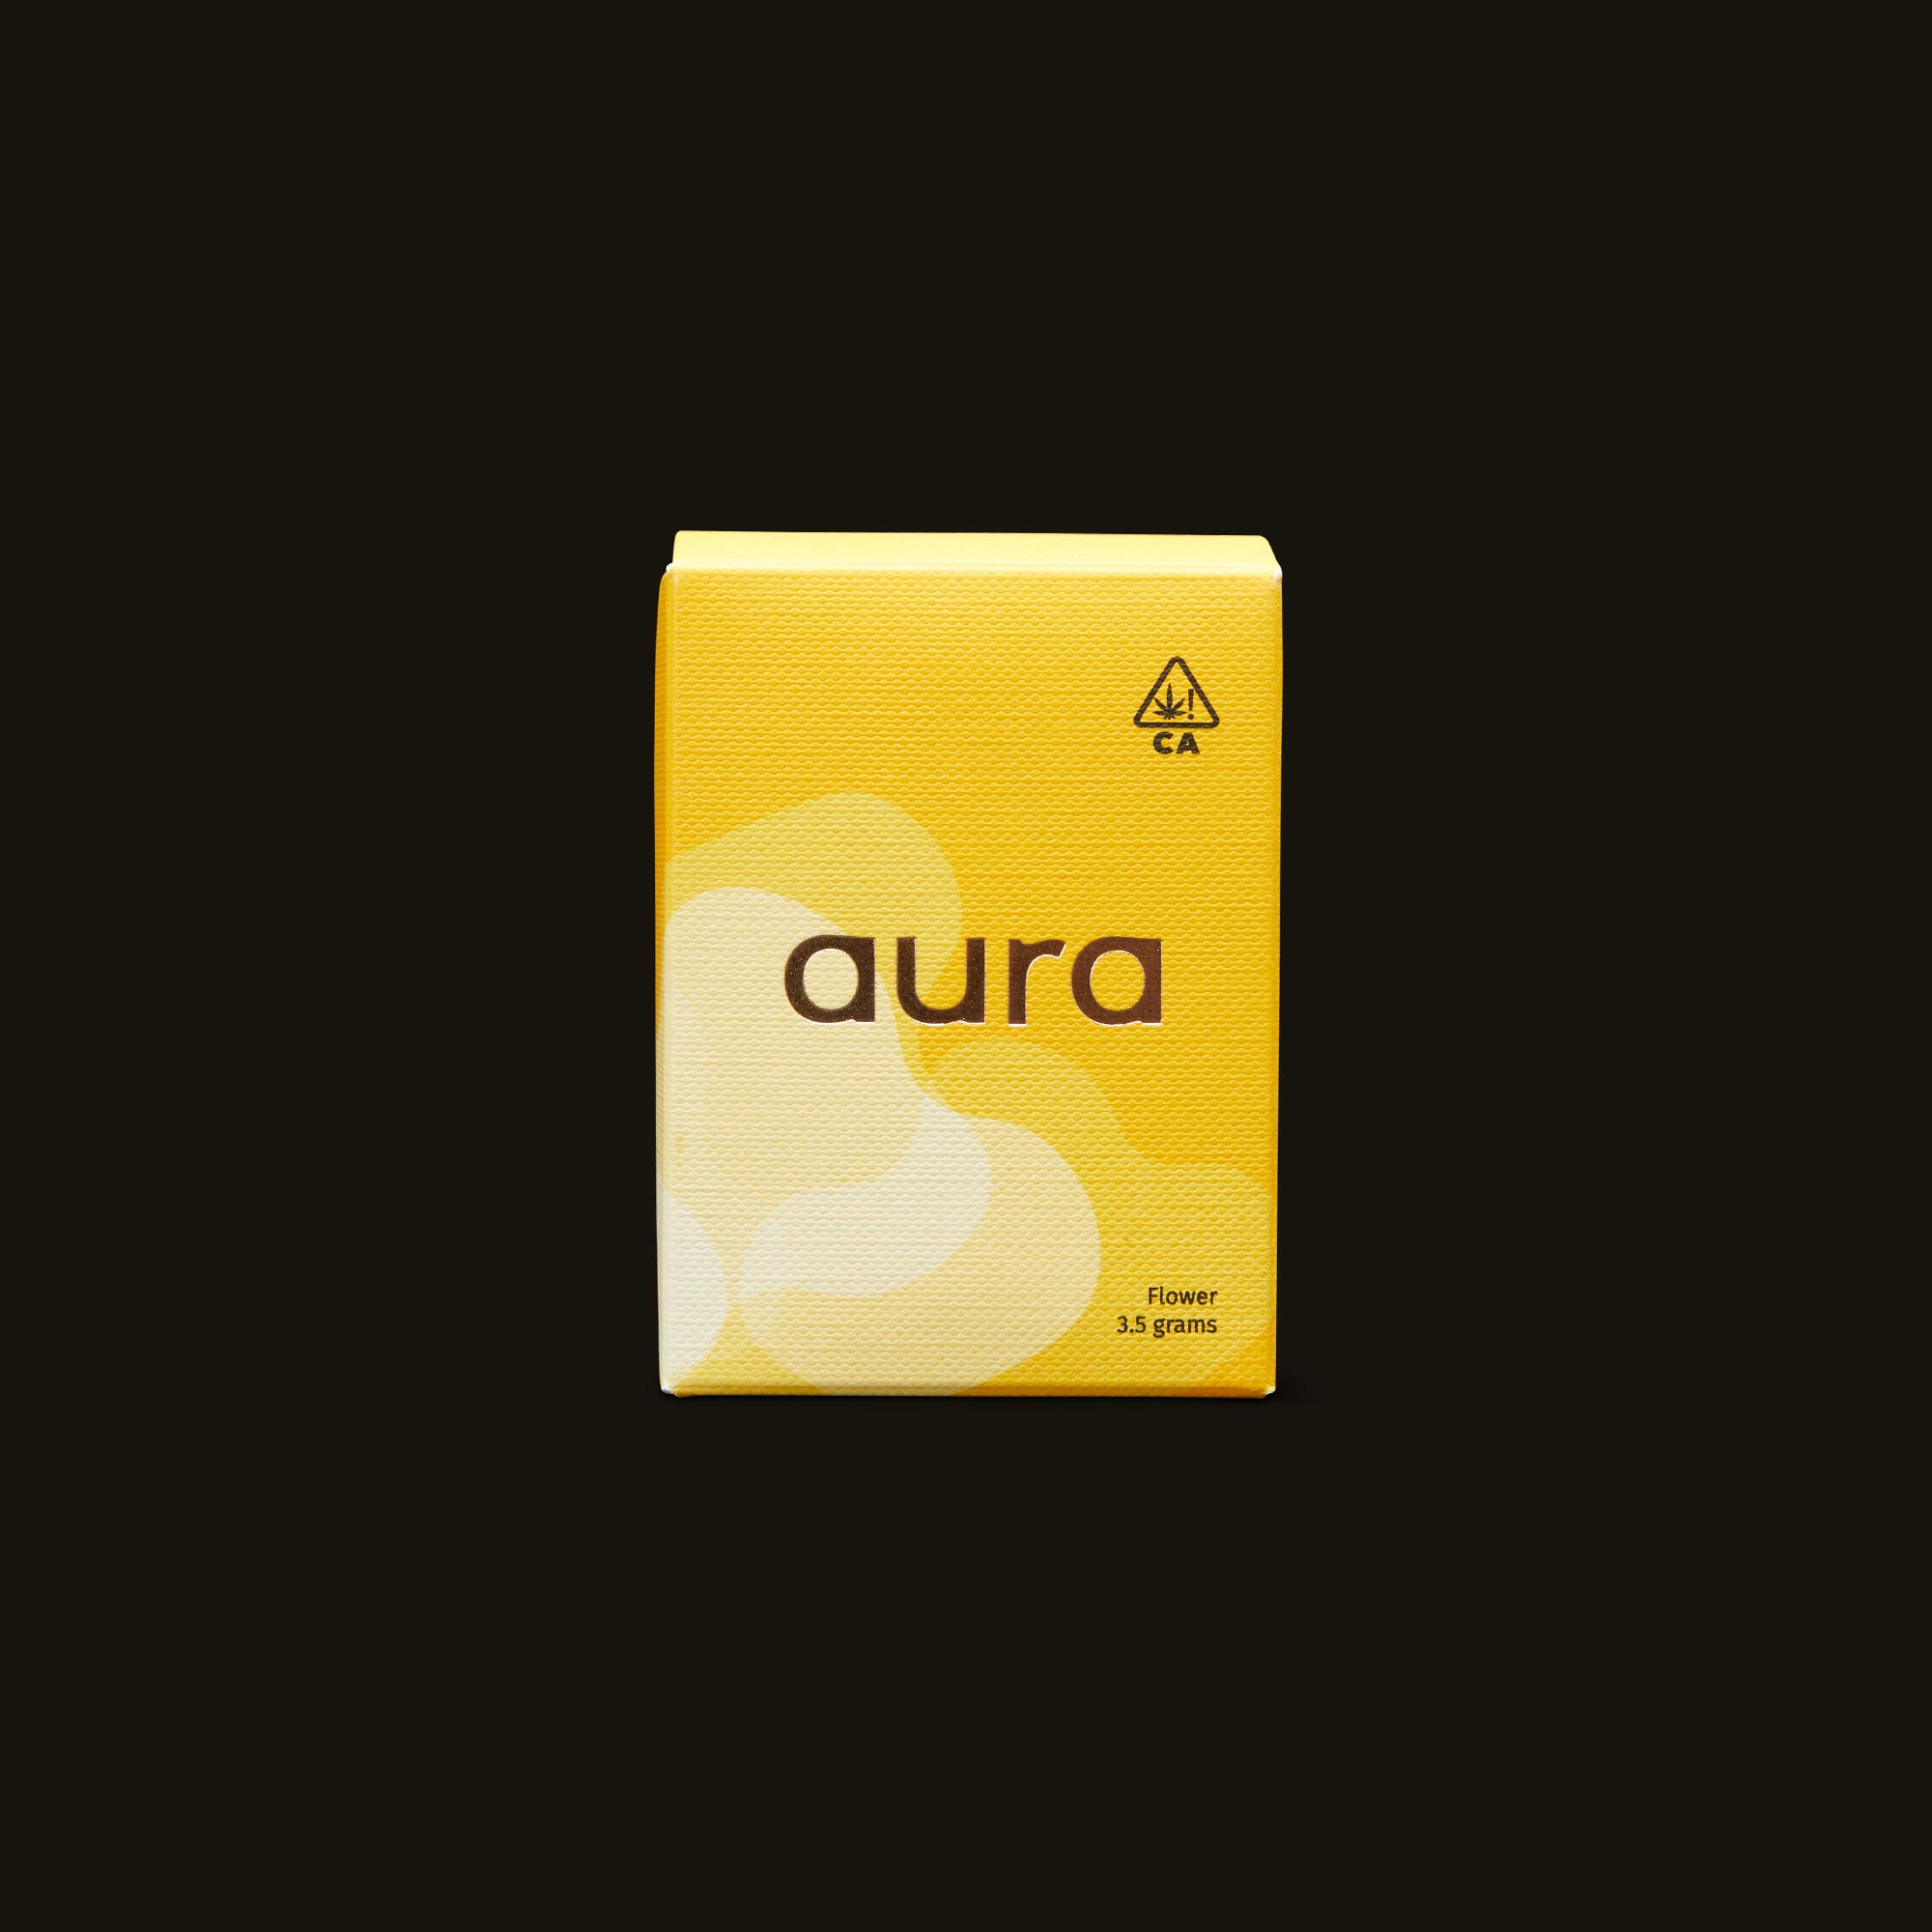 Aura Roar Front Box